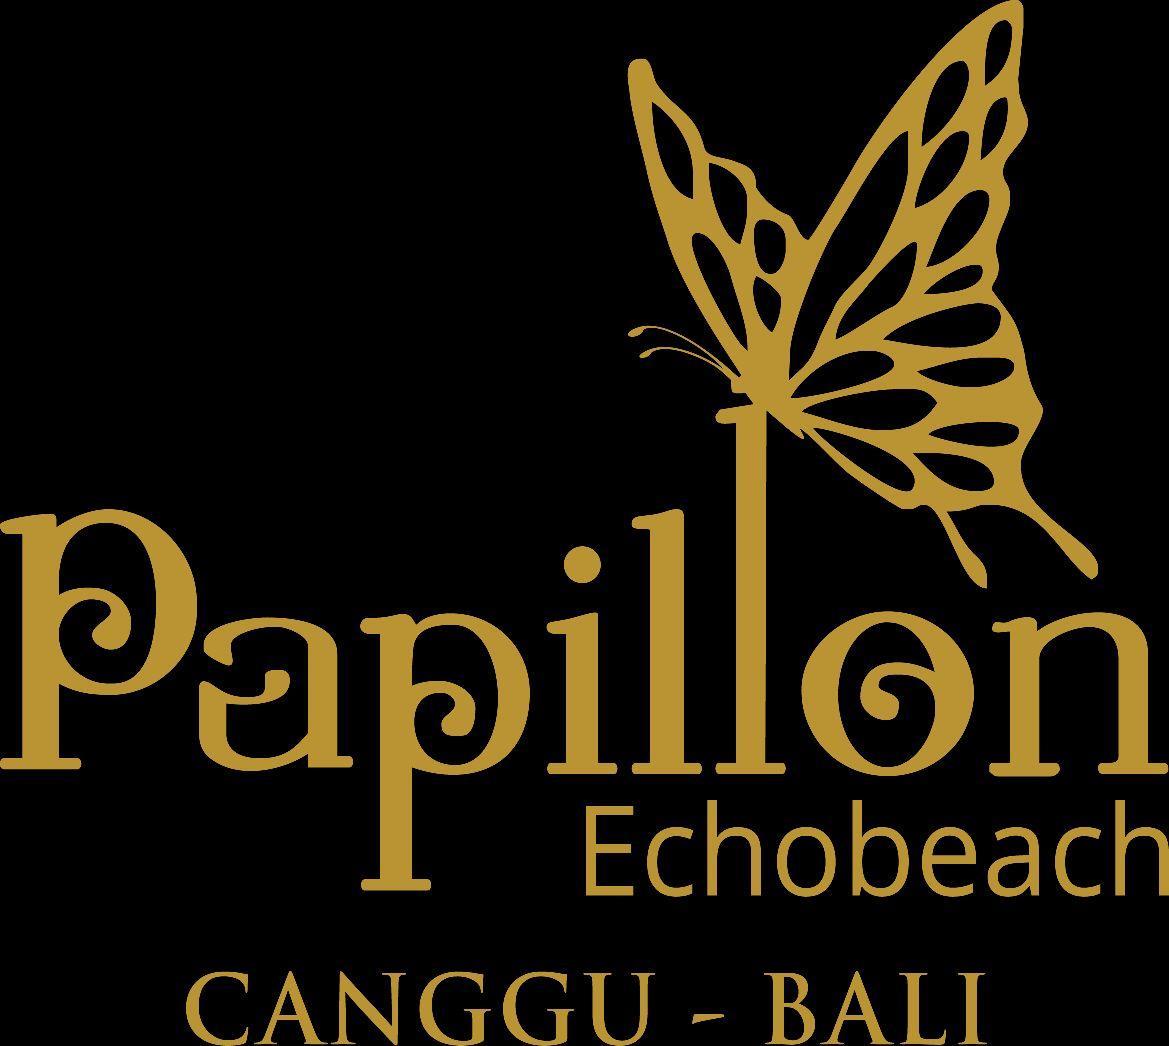 Papillon Echobeach ホテル詳細